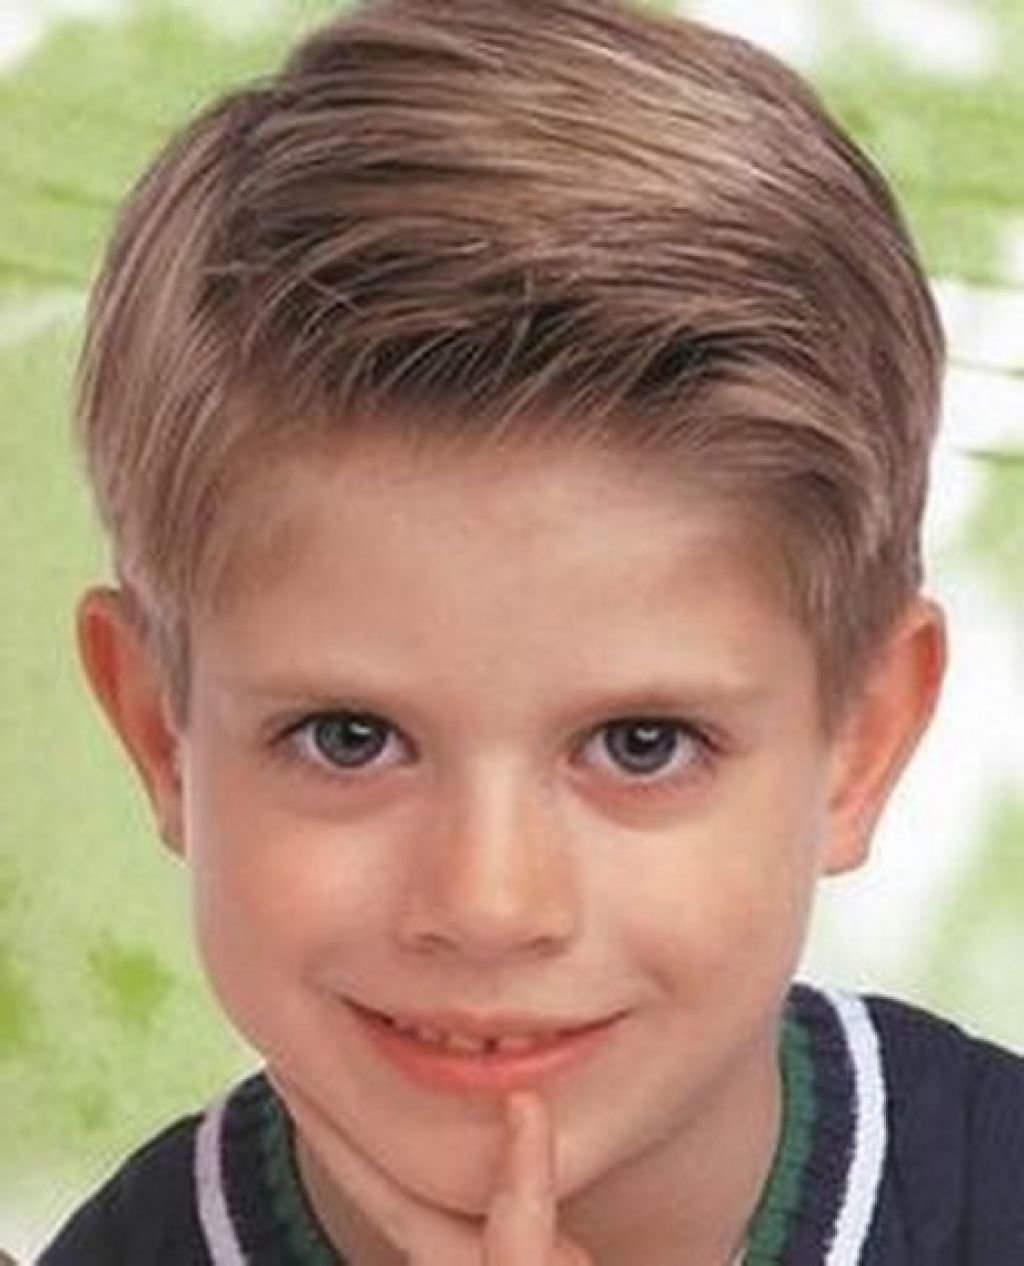 Прически на мальчика 14 лет фото